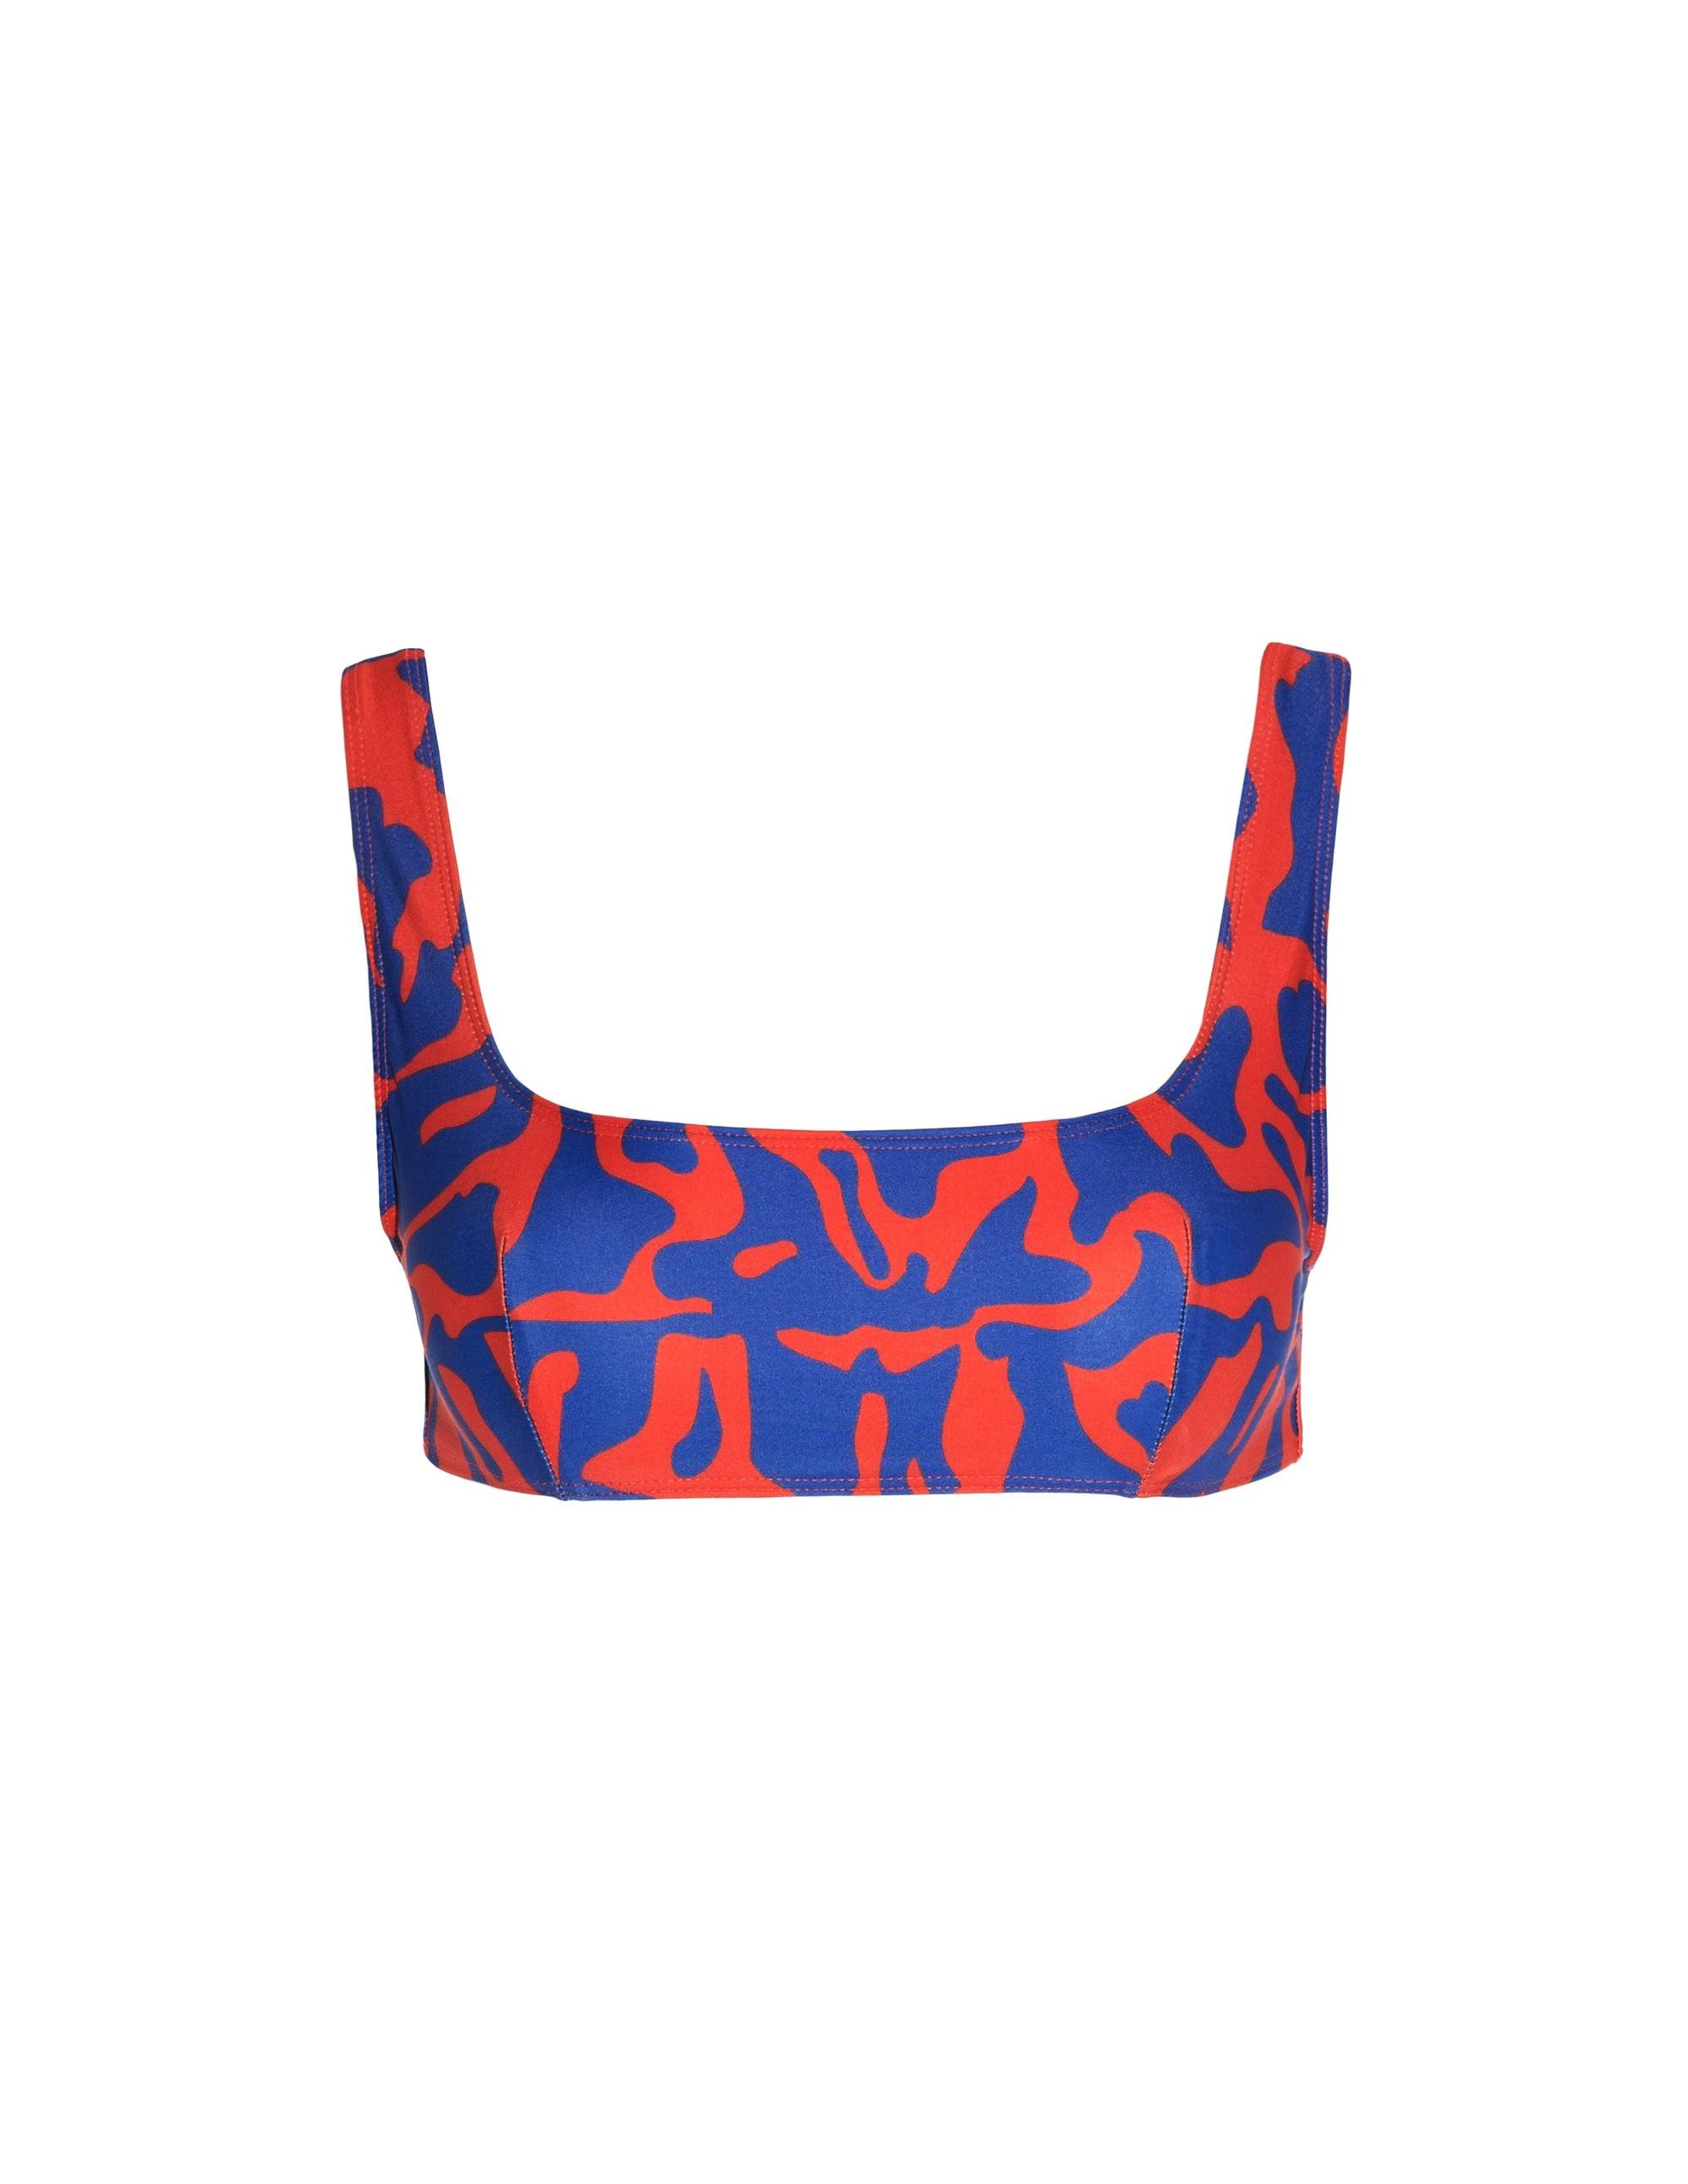 VIK bikini top - MIMETRIC